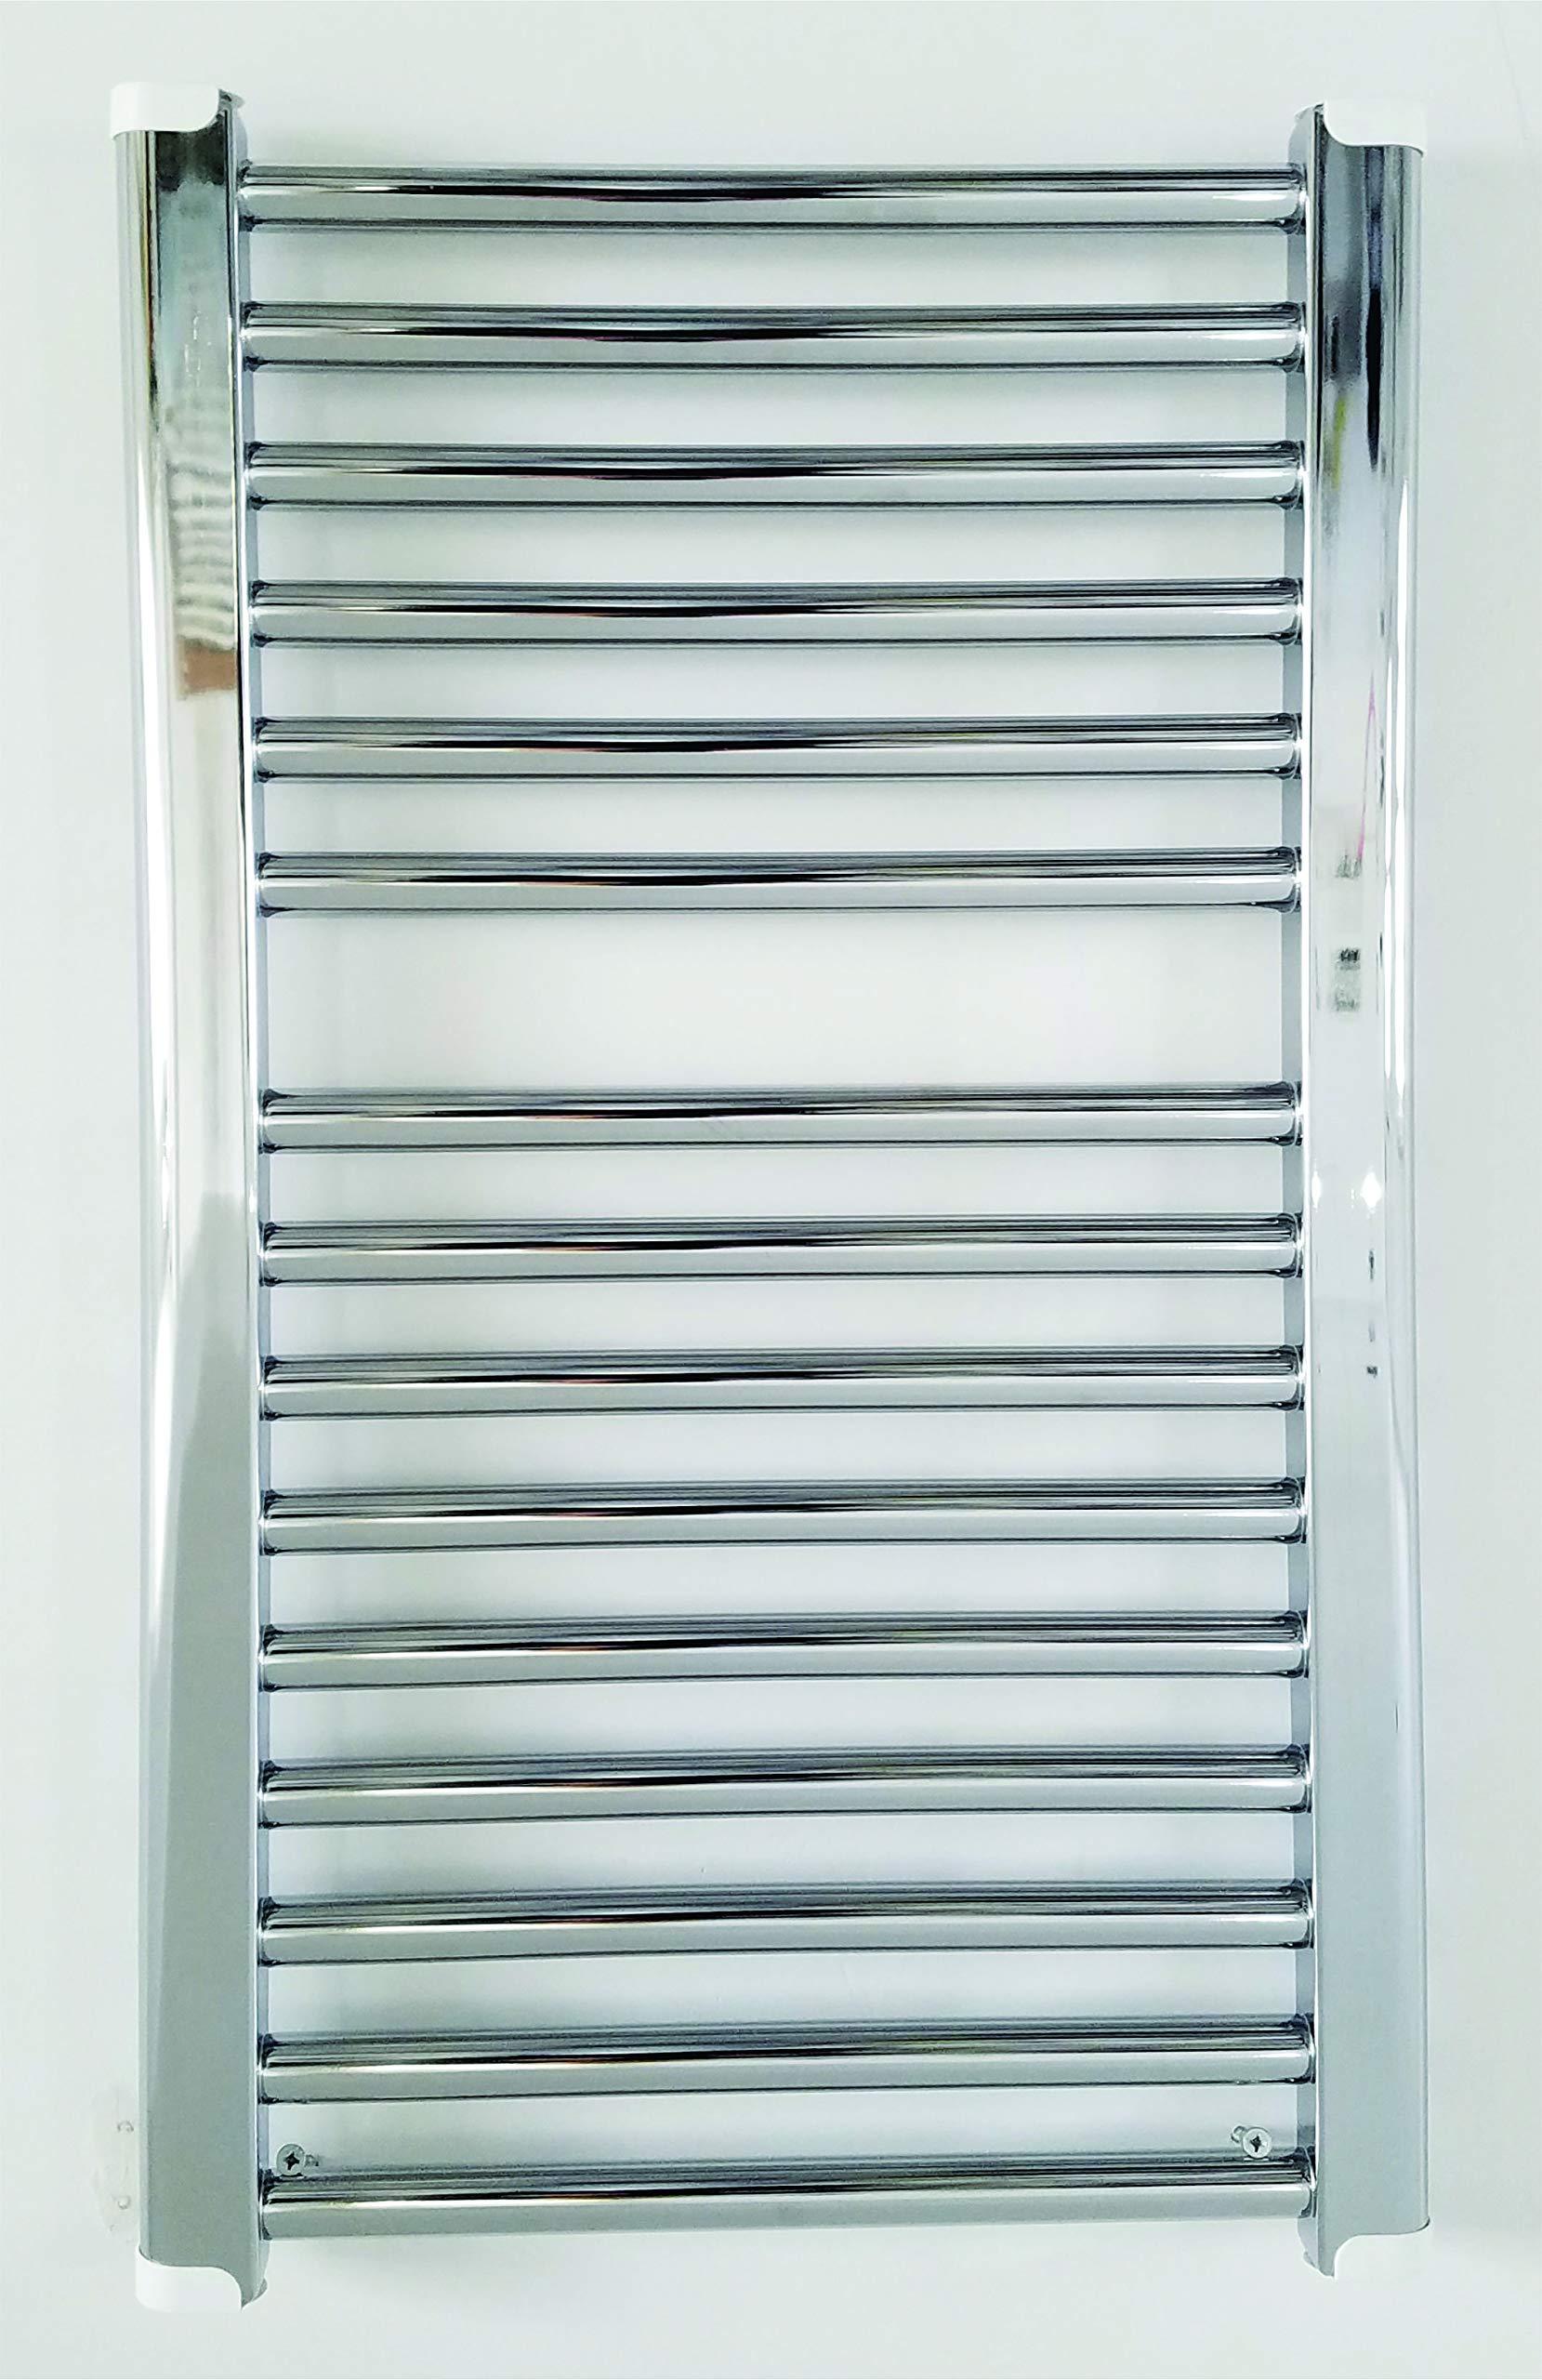 Cordivari Chromed Towel Warmer Hydronic Straight 16x28 in Europe Design Radiant